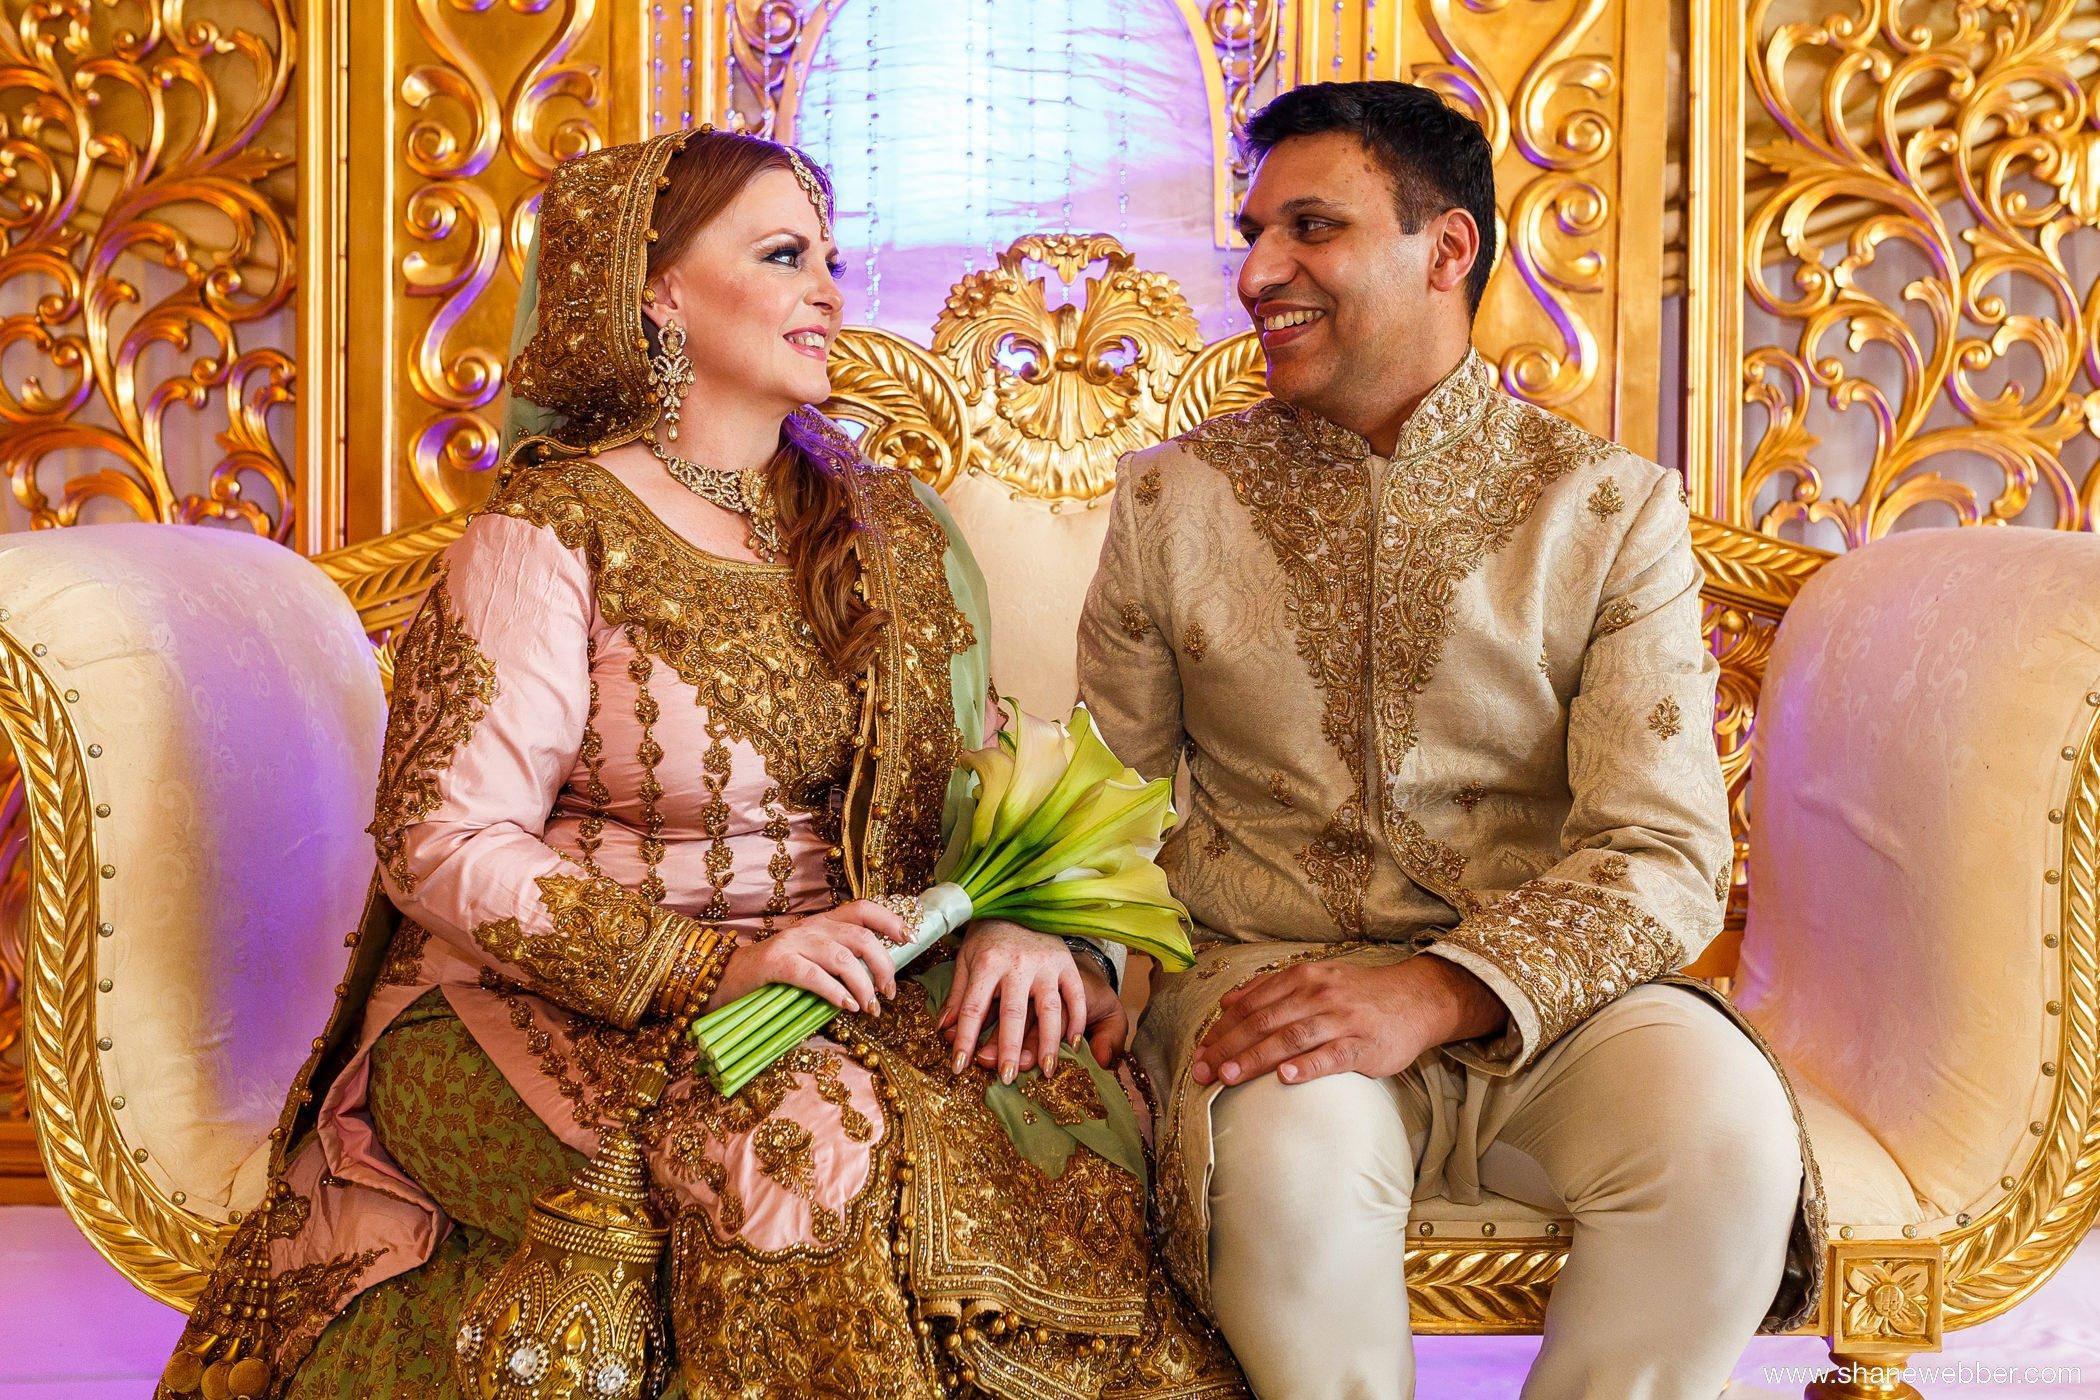 Asian throne wedding photo